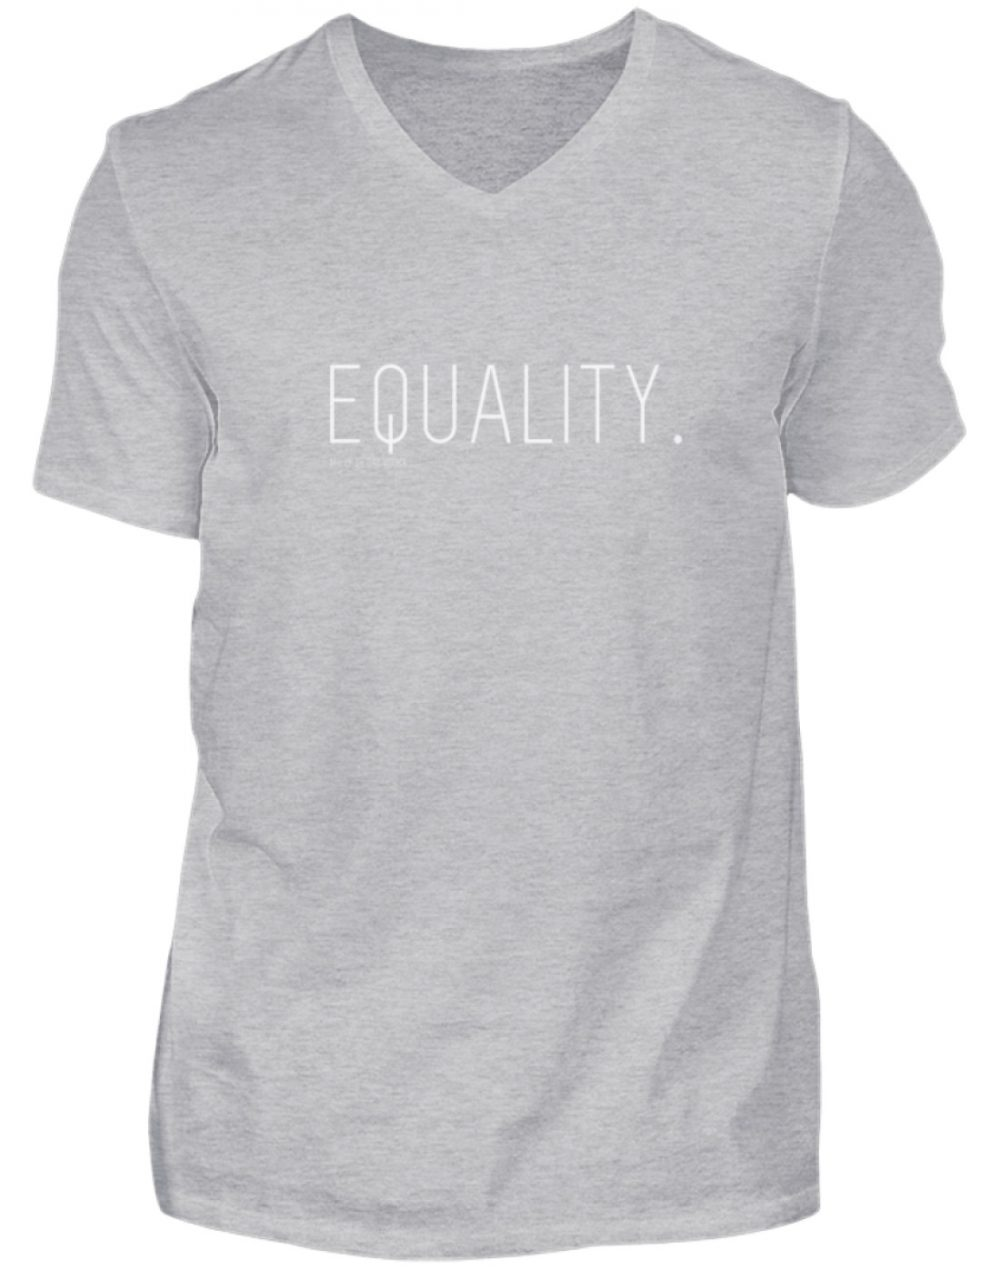 EQUALITY. - Herren V-Neck Shirt-17